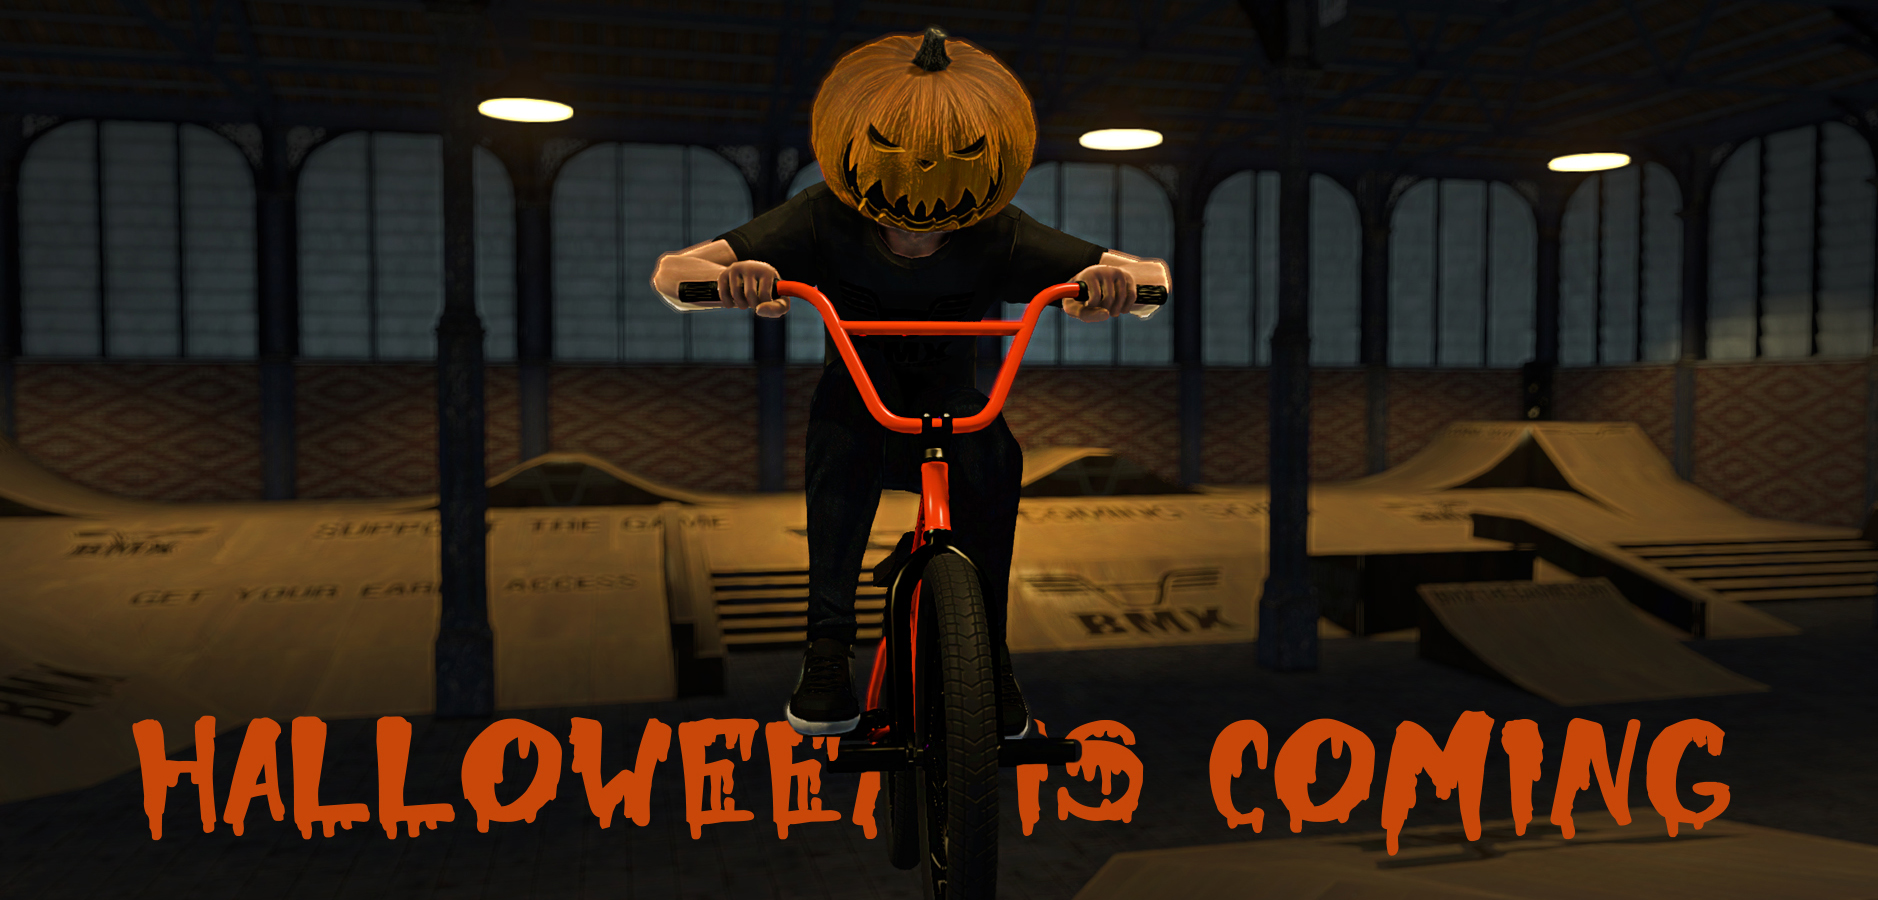 halloweenportadablog